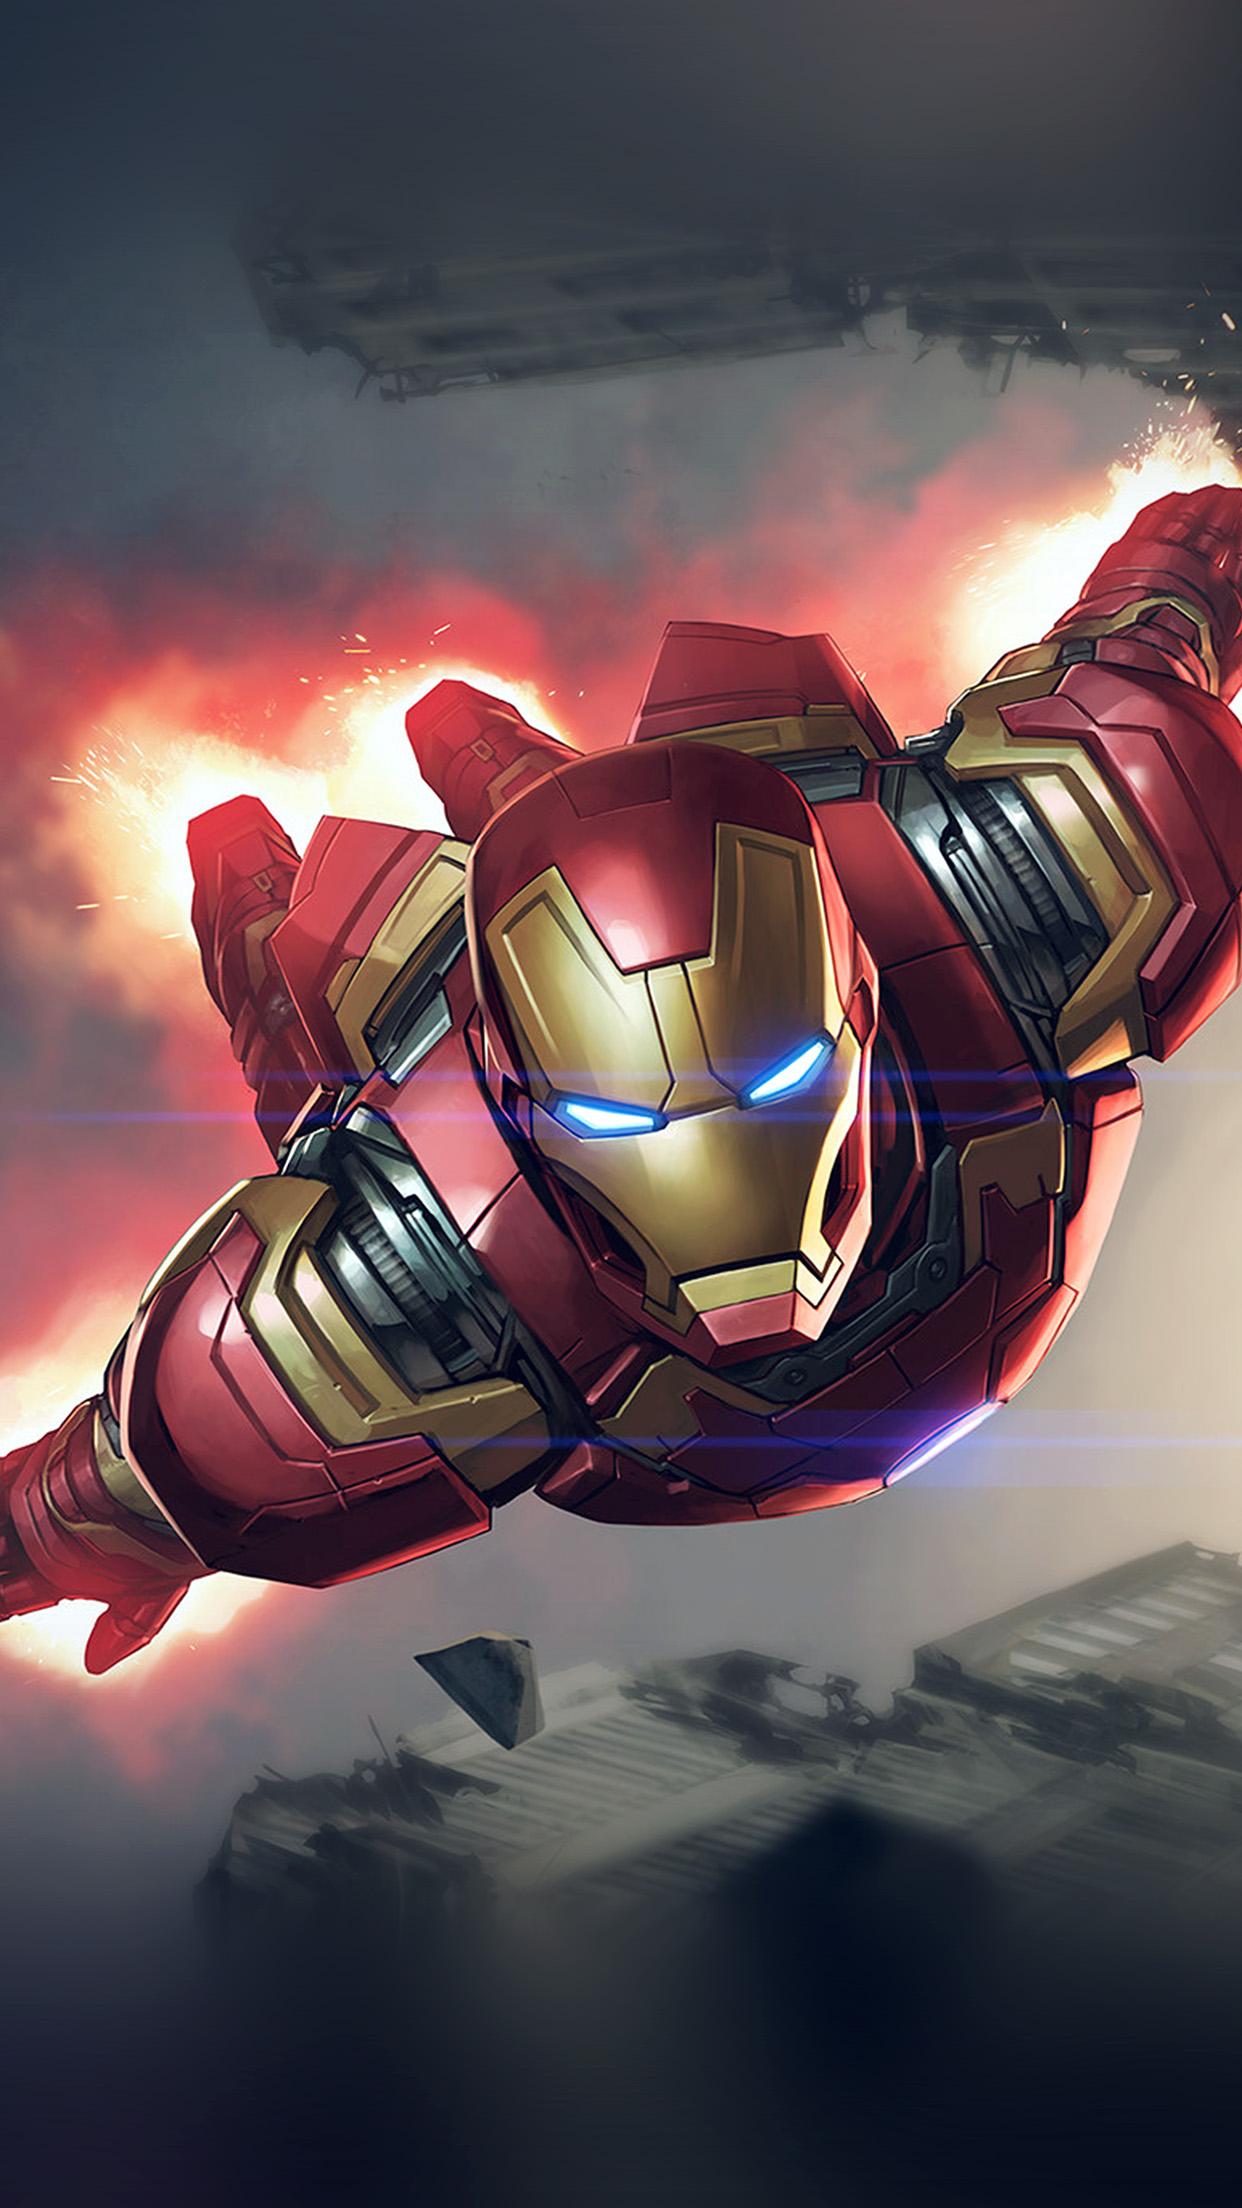 Iphone6papers Com Iphone 6 Wallpaper Az70 Ironman Hero Marvel